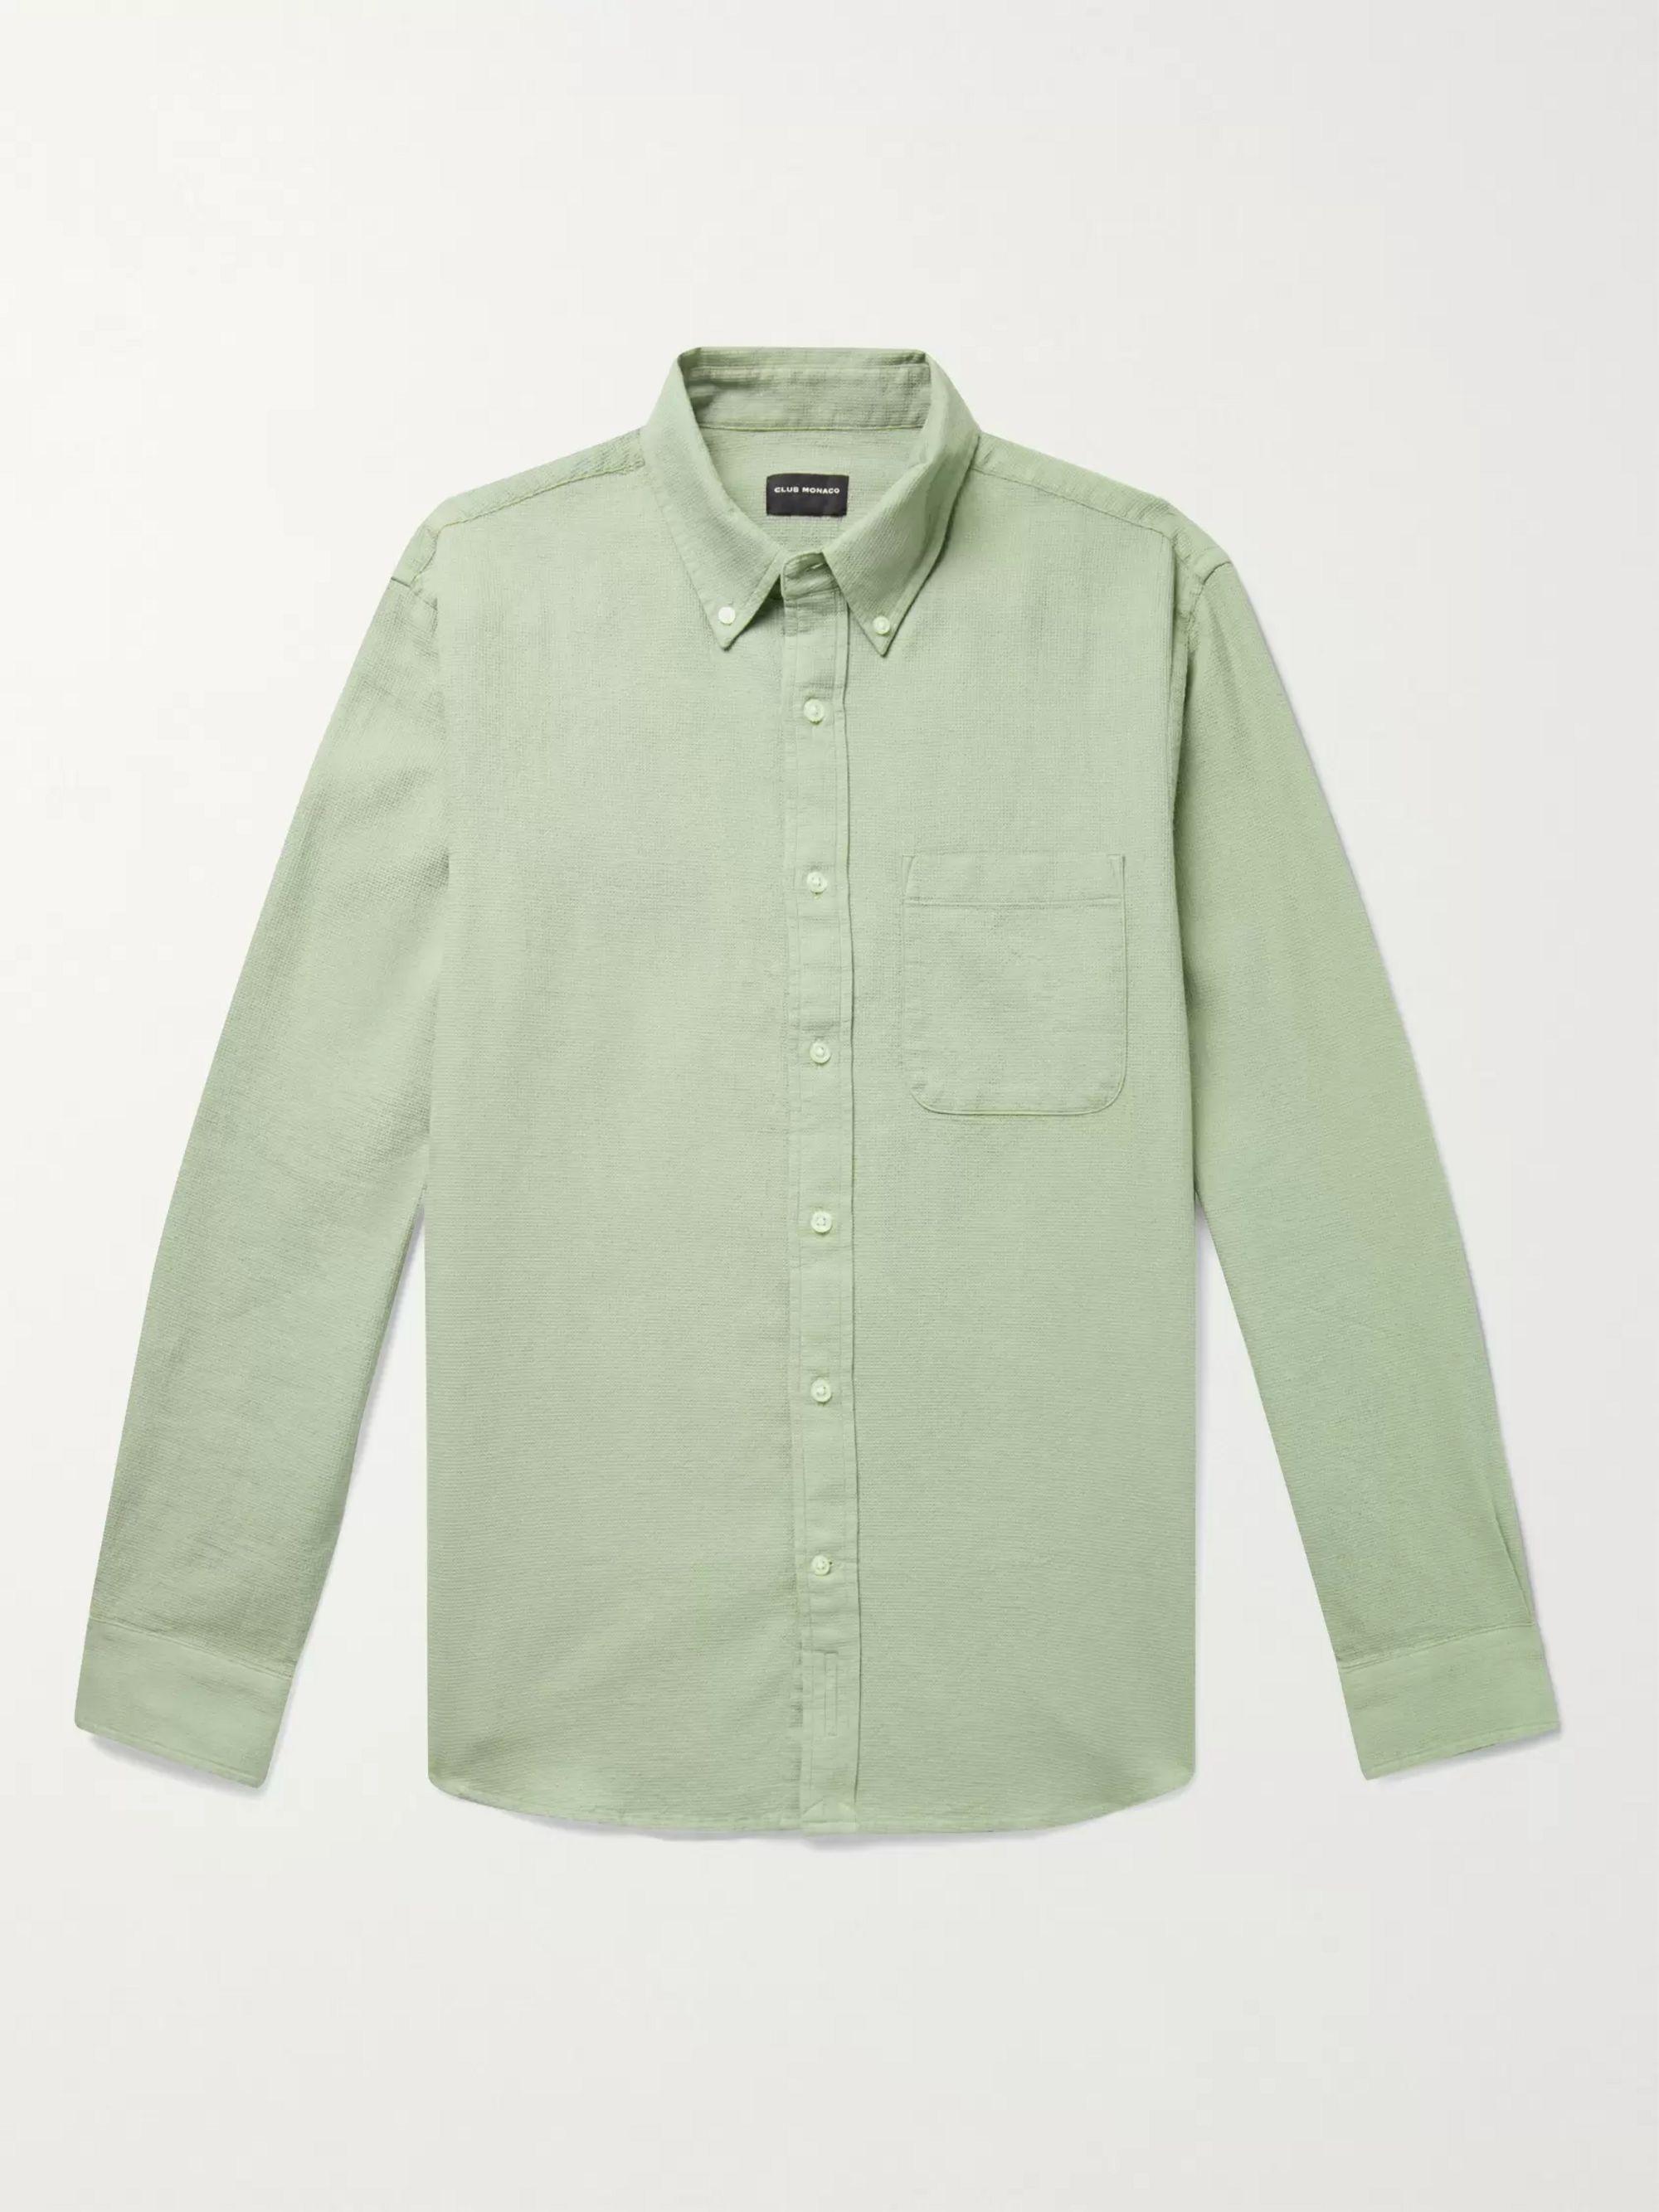 CLUB MONACO Button-Down Collar Waffle-Knit Cotton Shirt